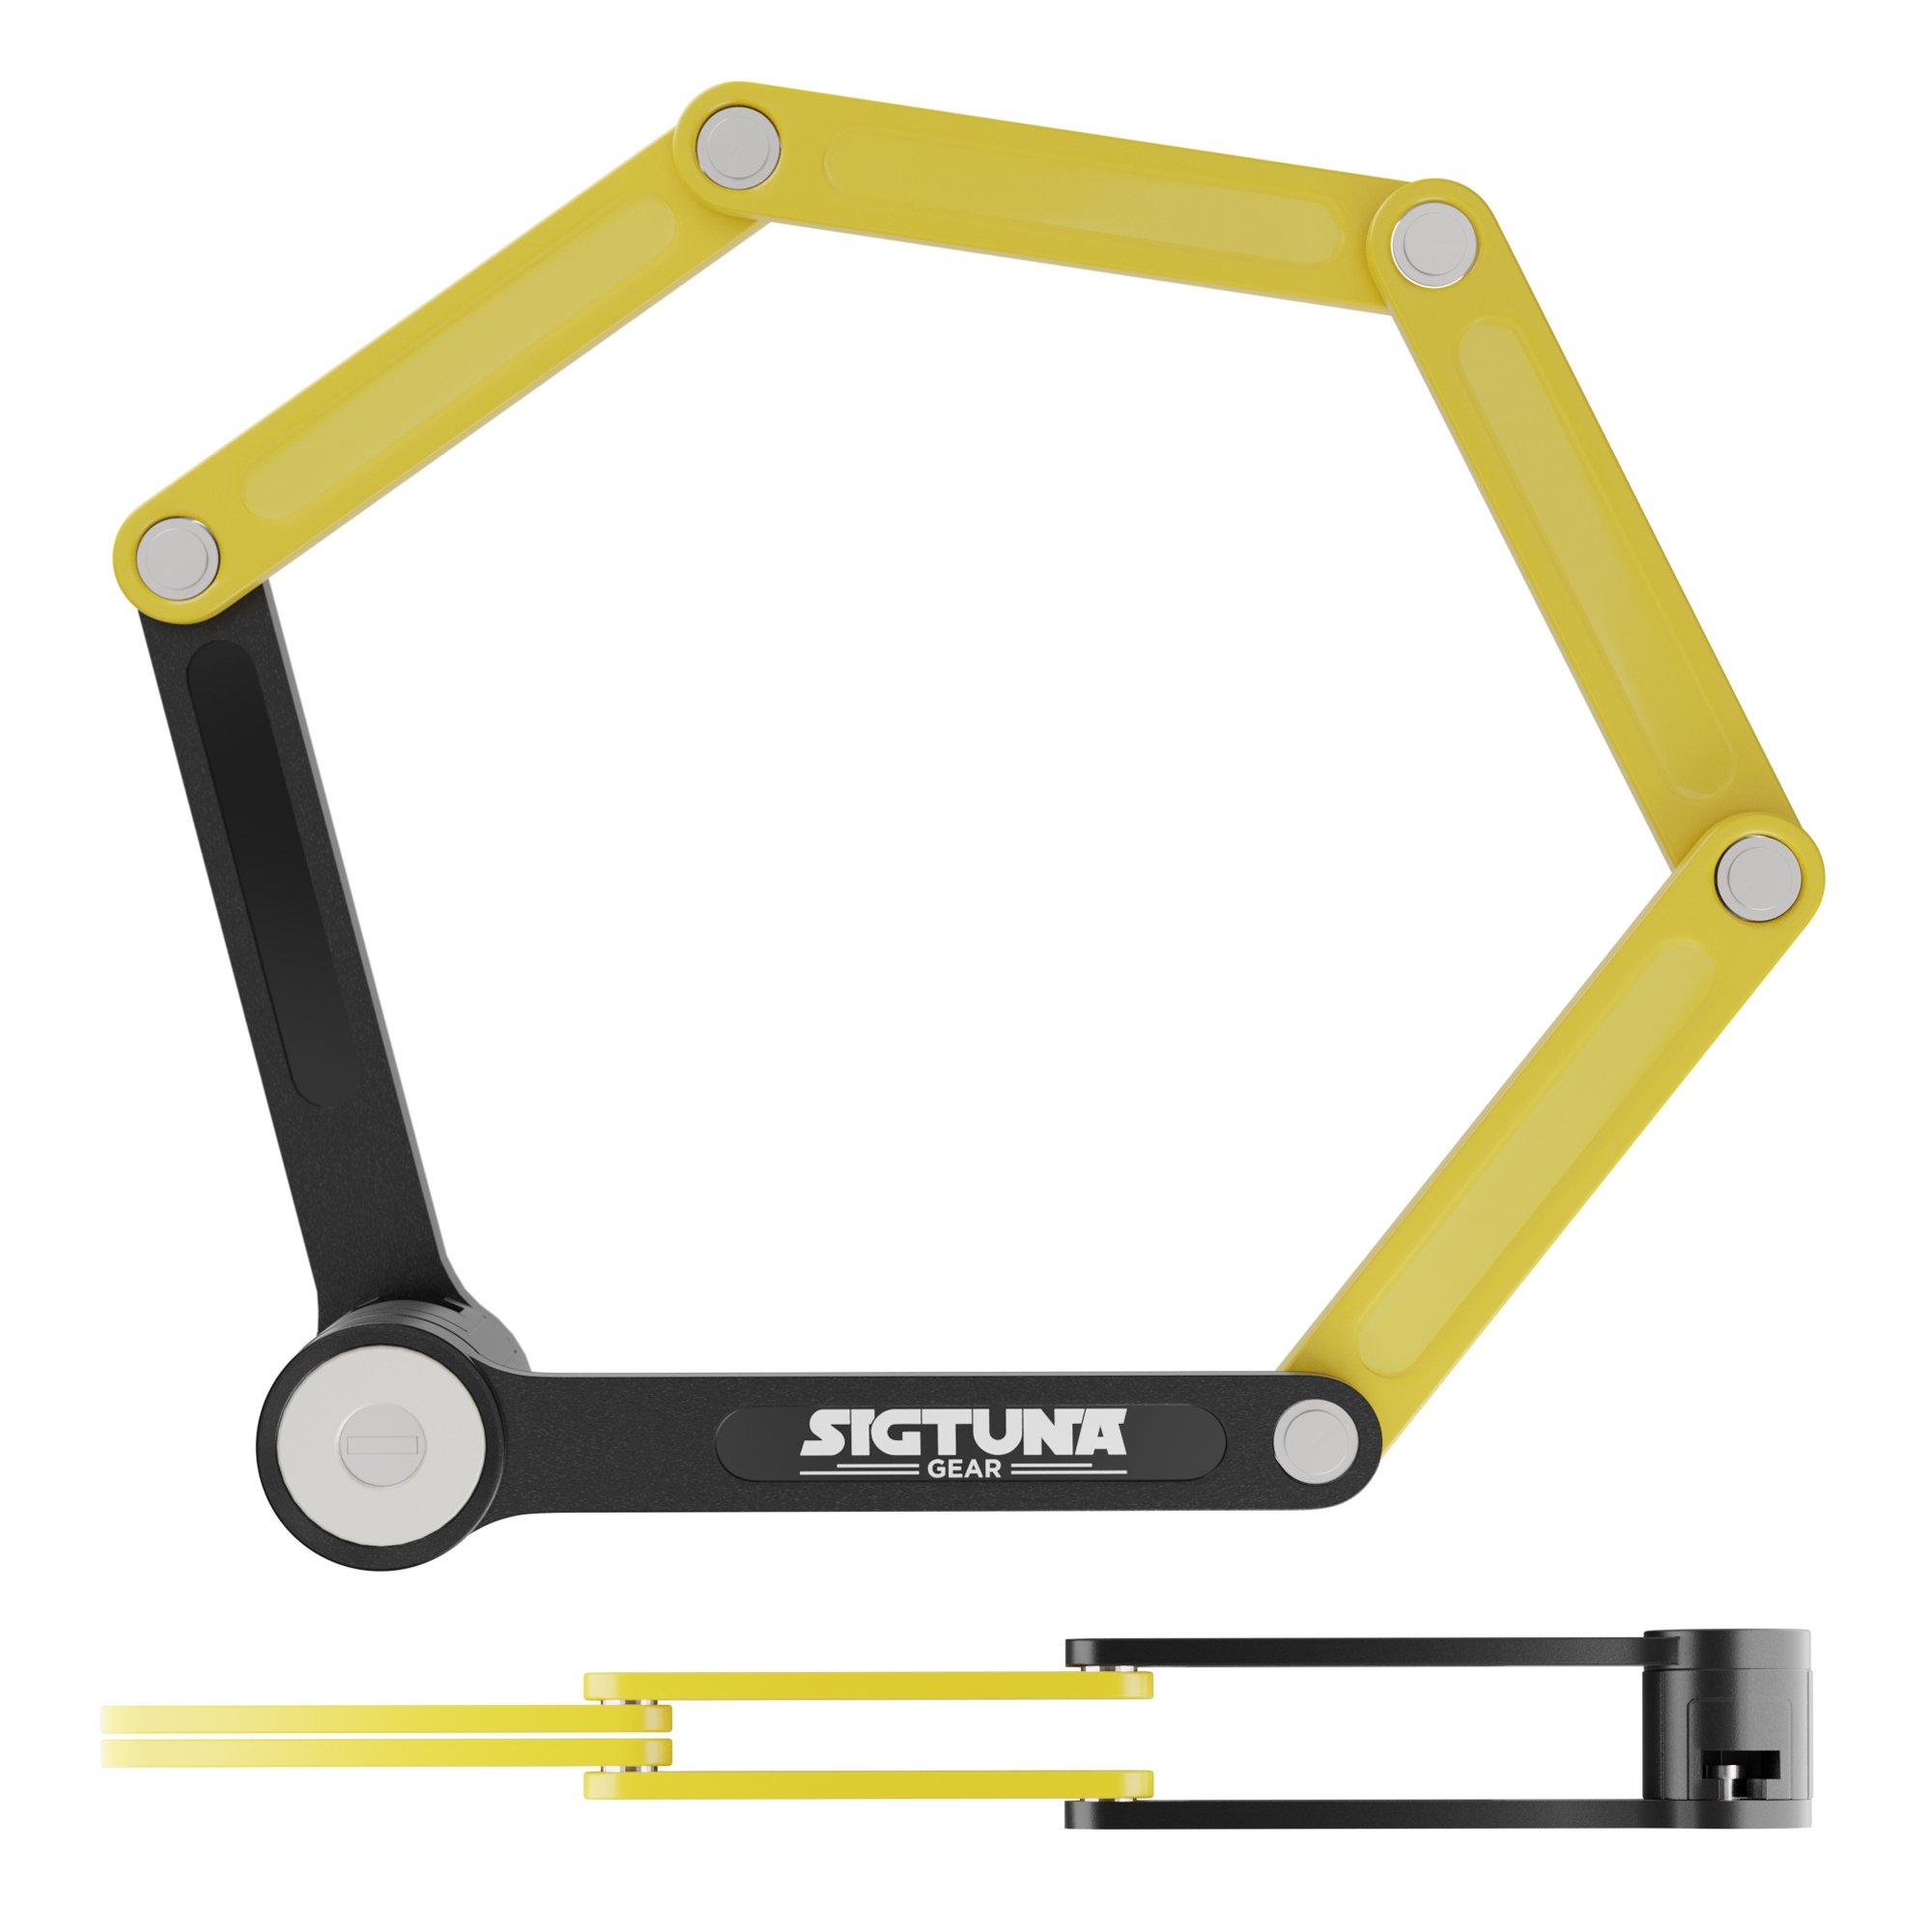 SIGTUNA Folding Bike Lock – Heavy Duty Fold Bike Lock Combination with Easy-to-Install U Mount Bracket Holder and 3-Piece Anti Pick Bike Folding Lock Key Set